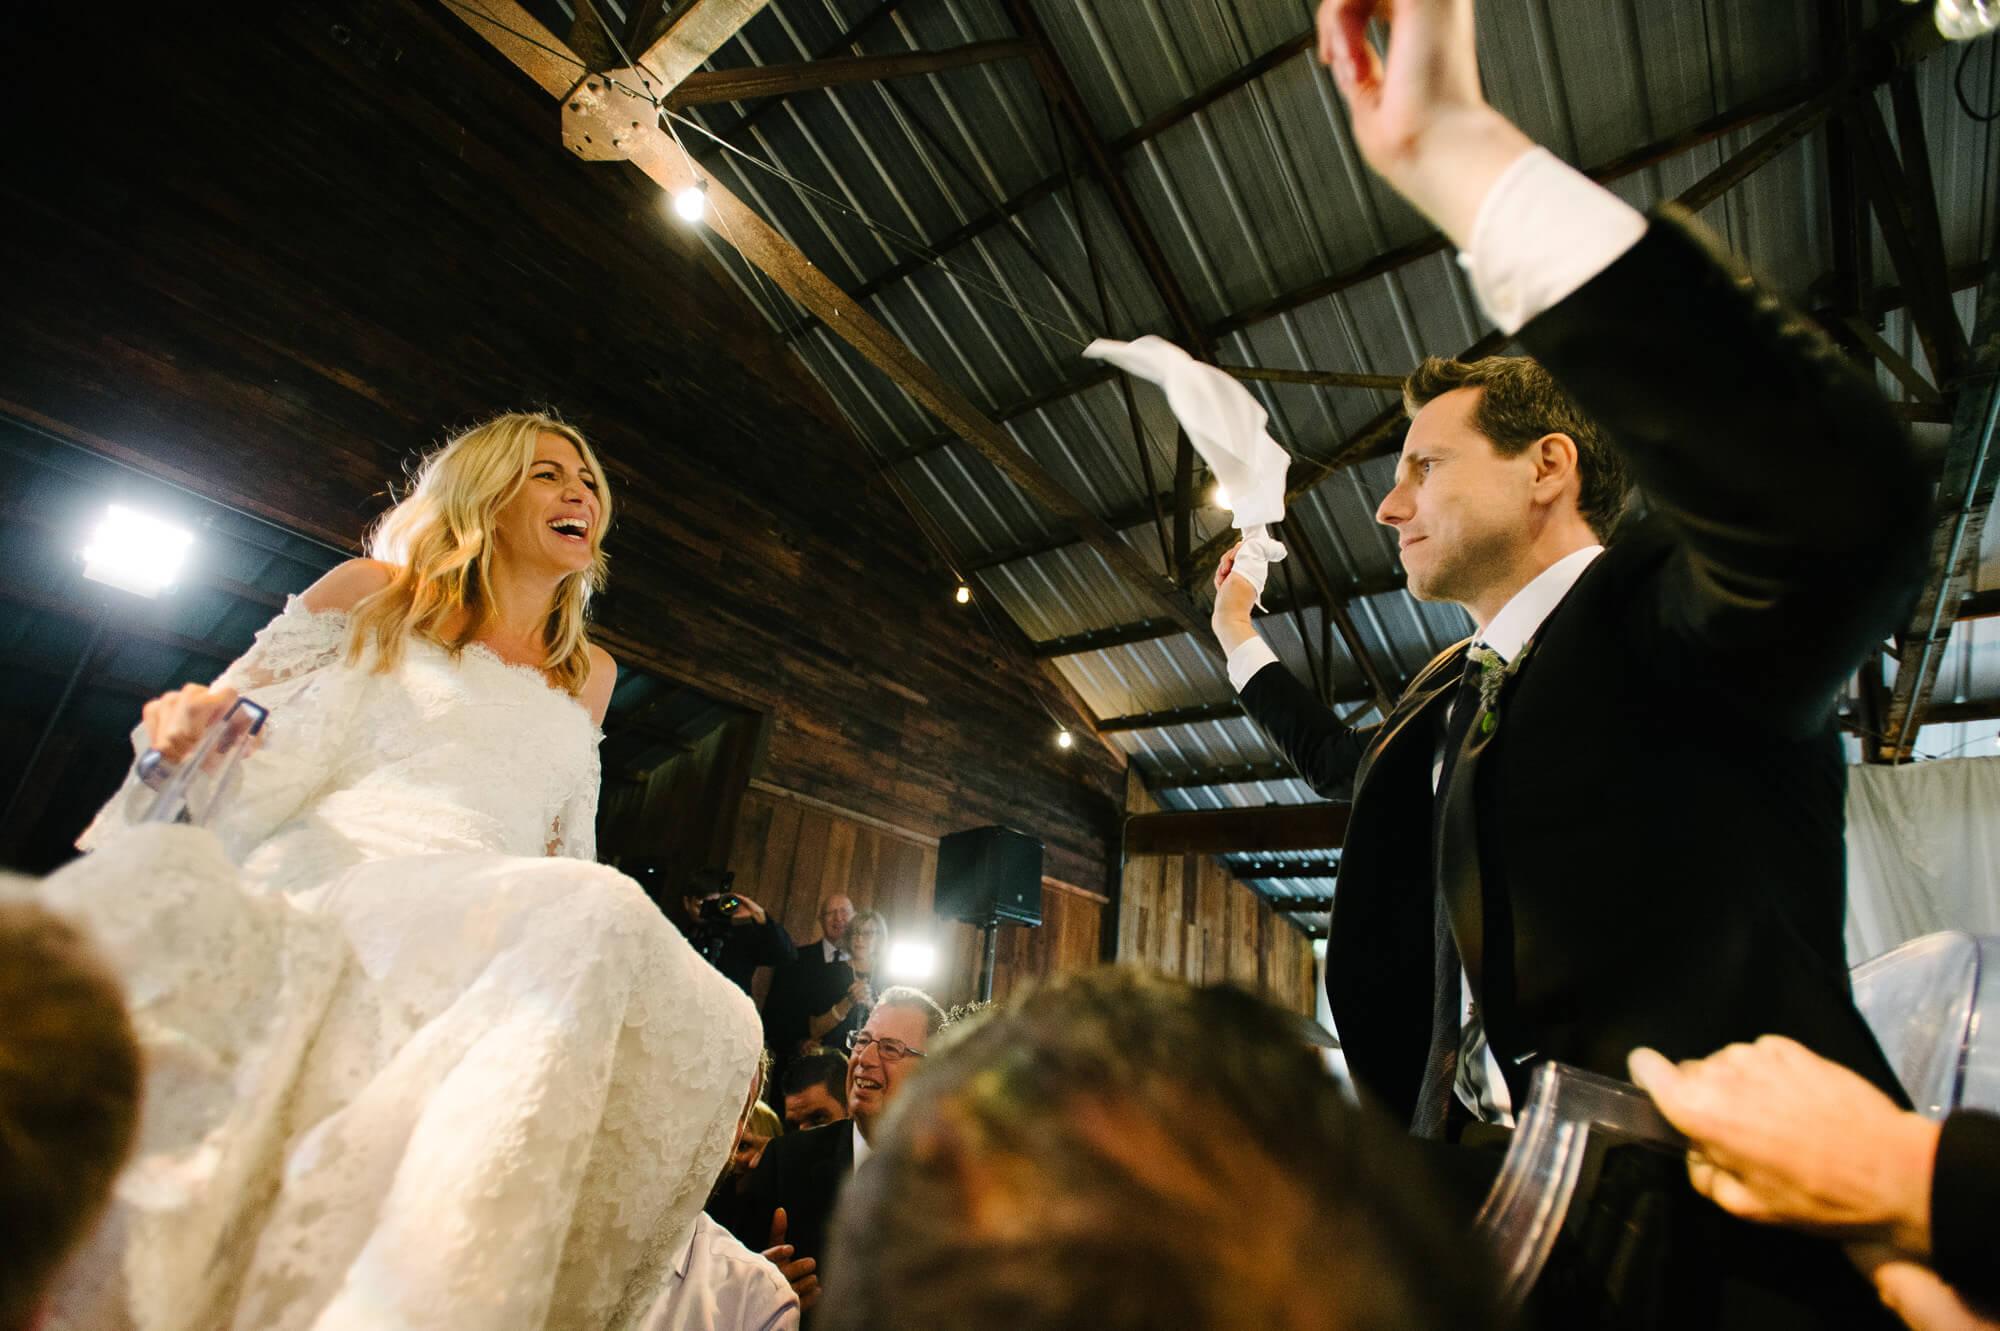 los-olivos-firestone-winery-destination-wedding-central-coast-wedding-photographer-26.jpg